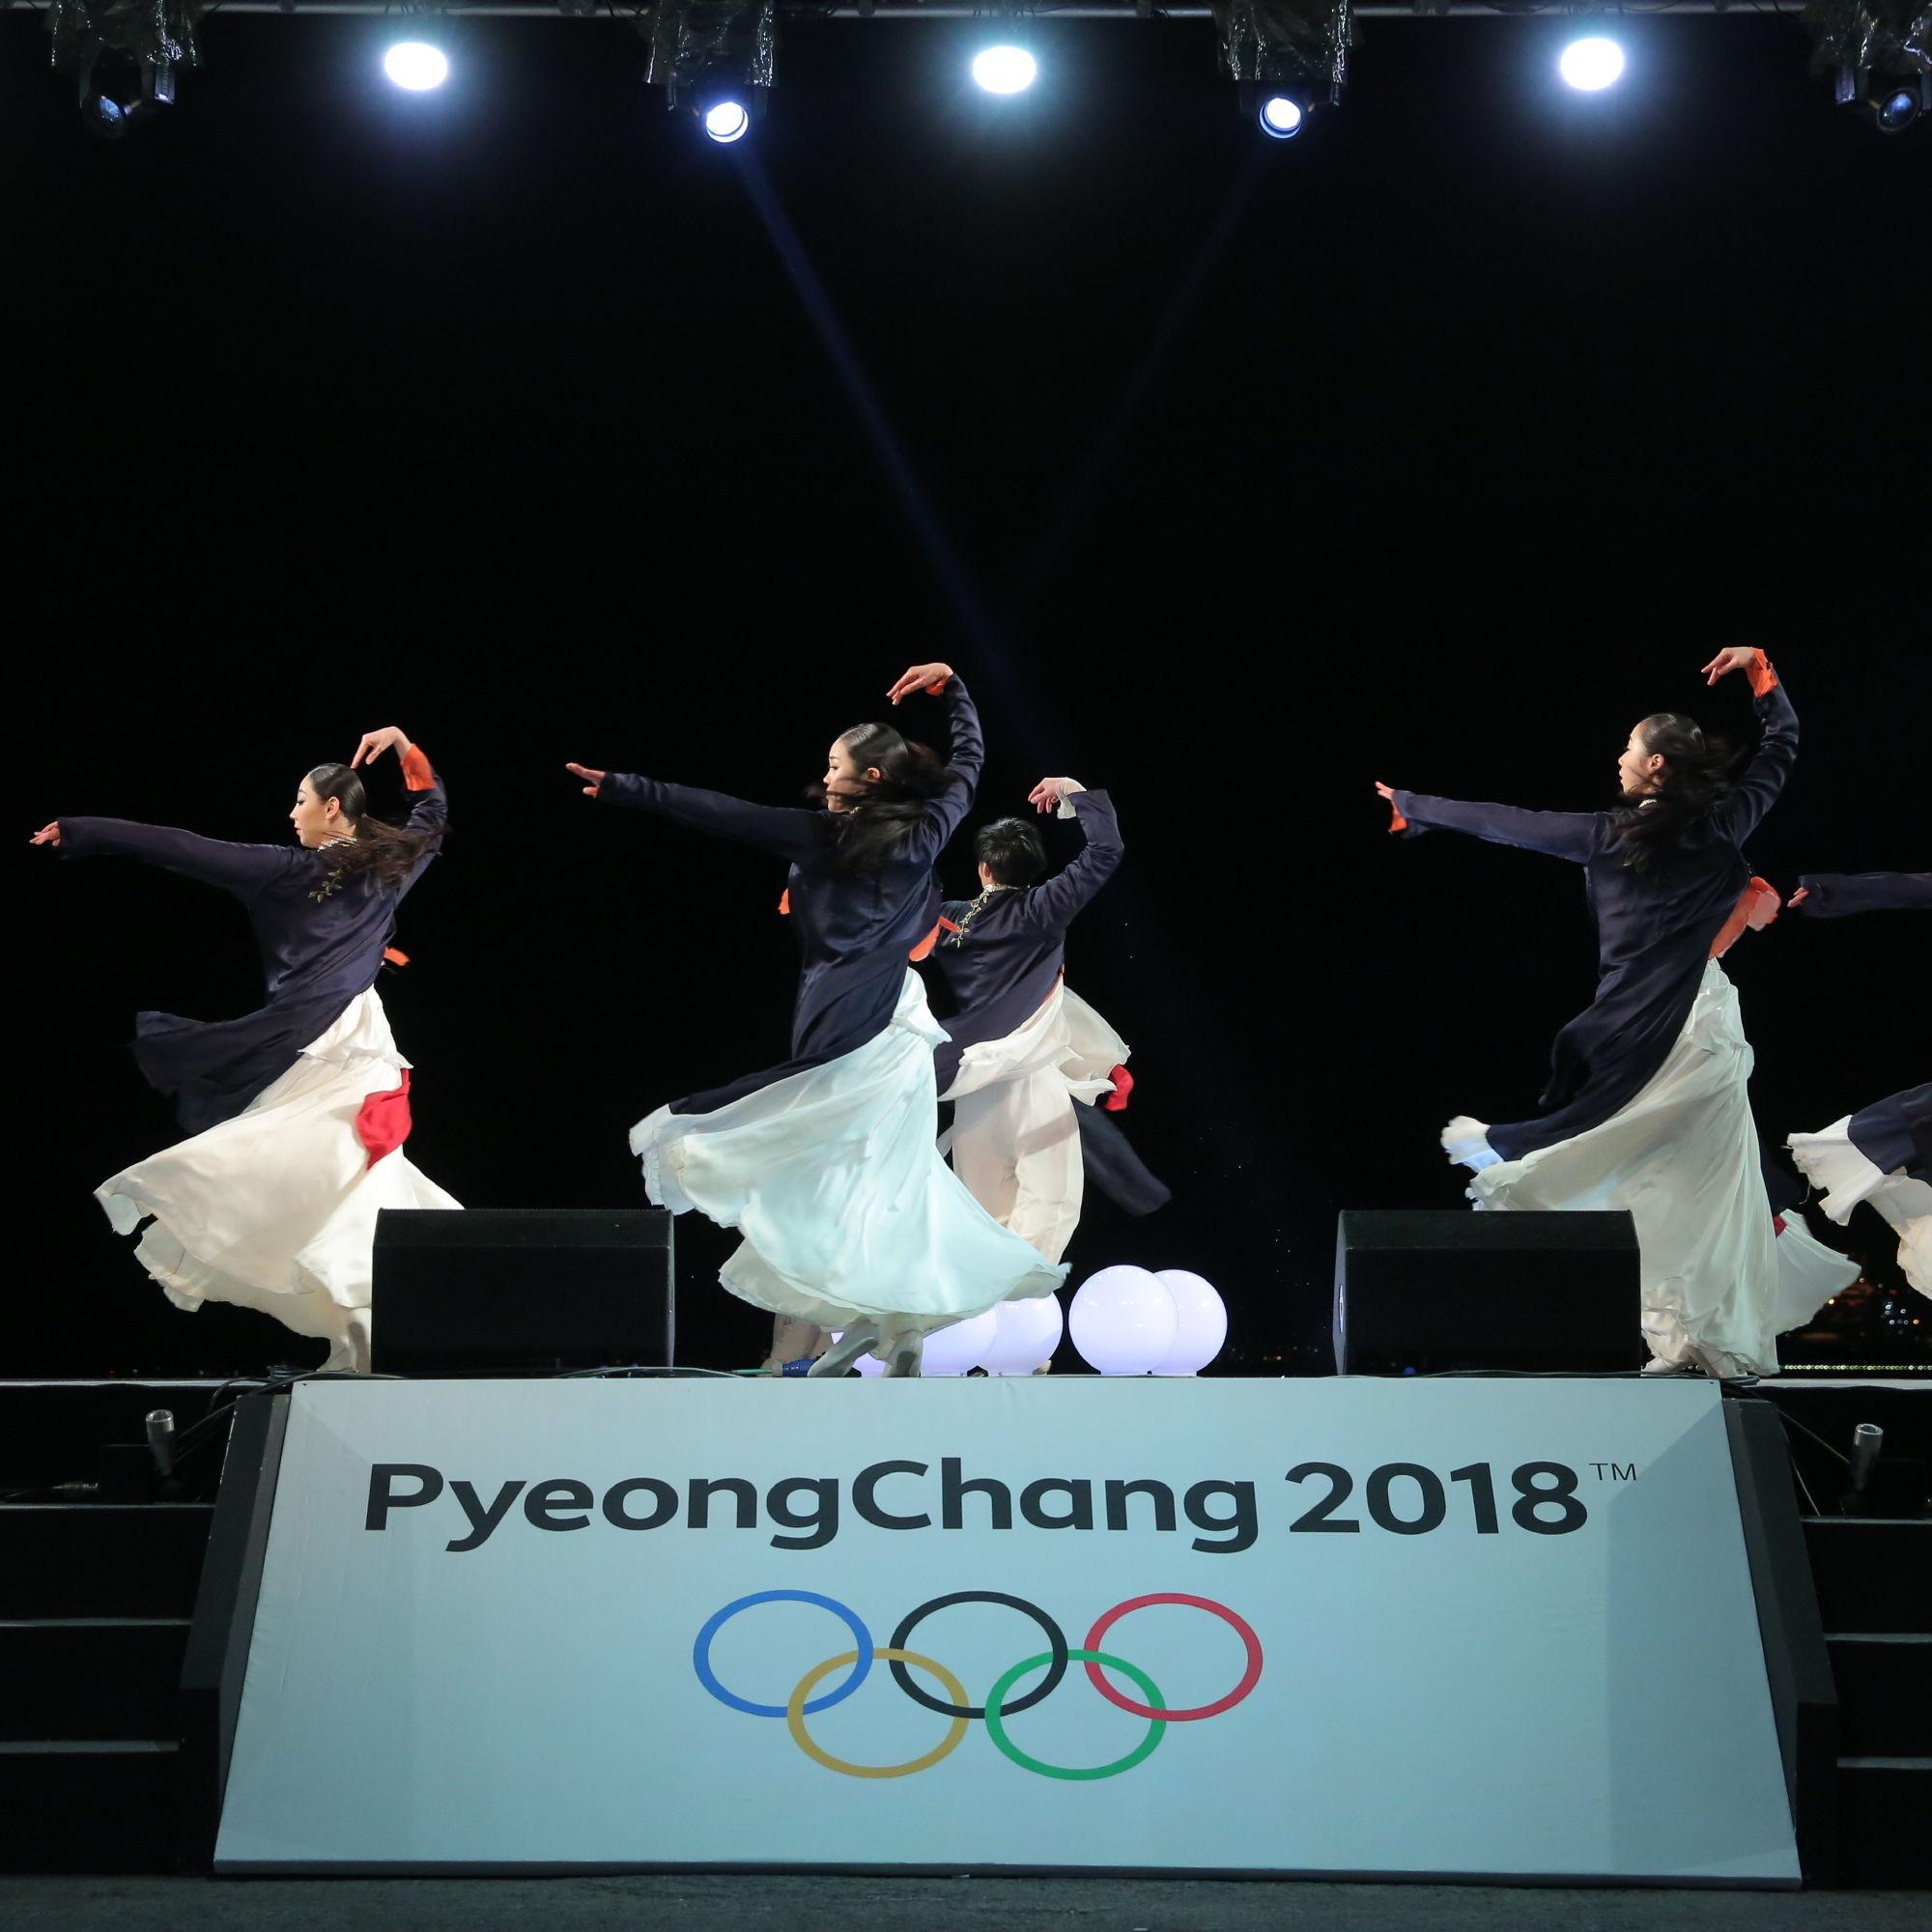 Pyeongchang 2018 o9lqpj